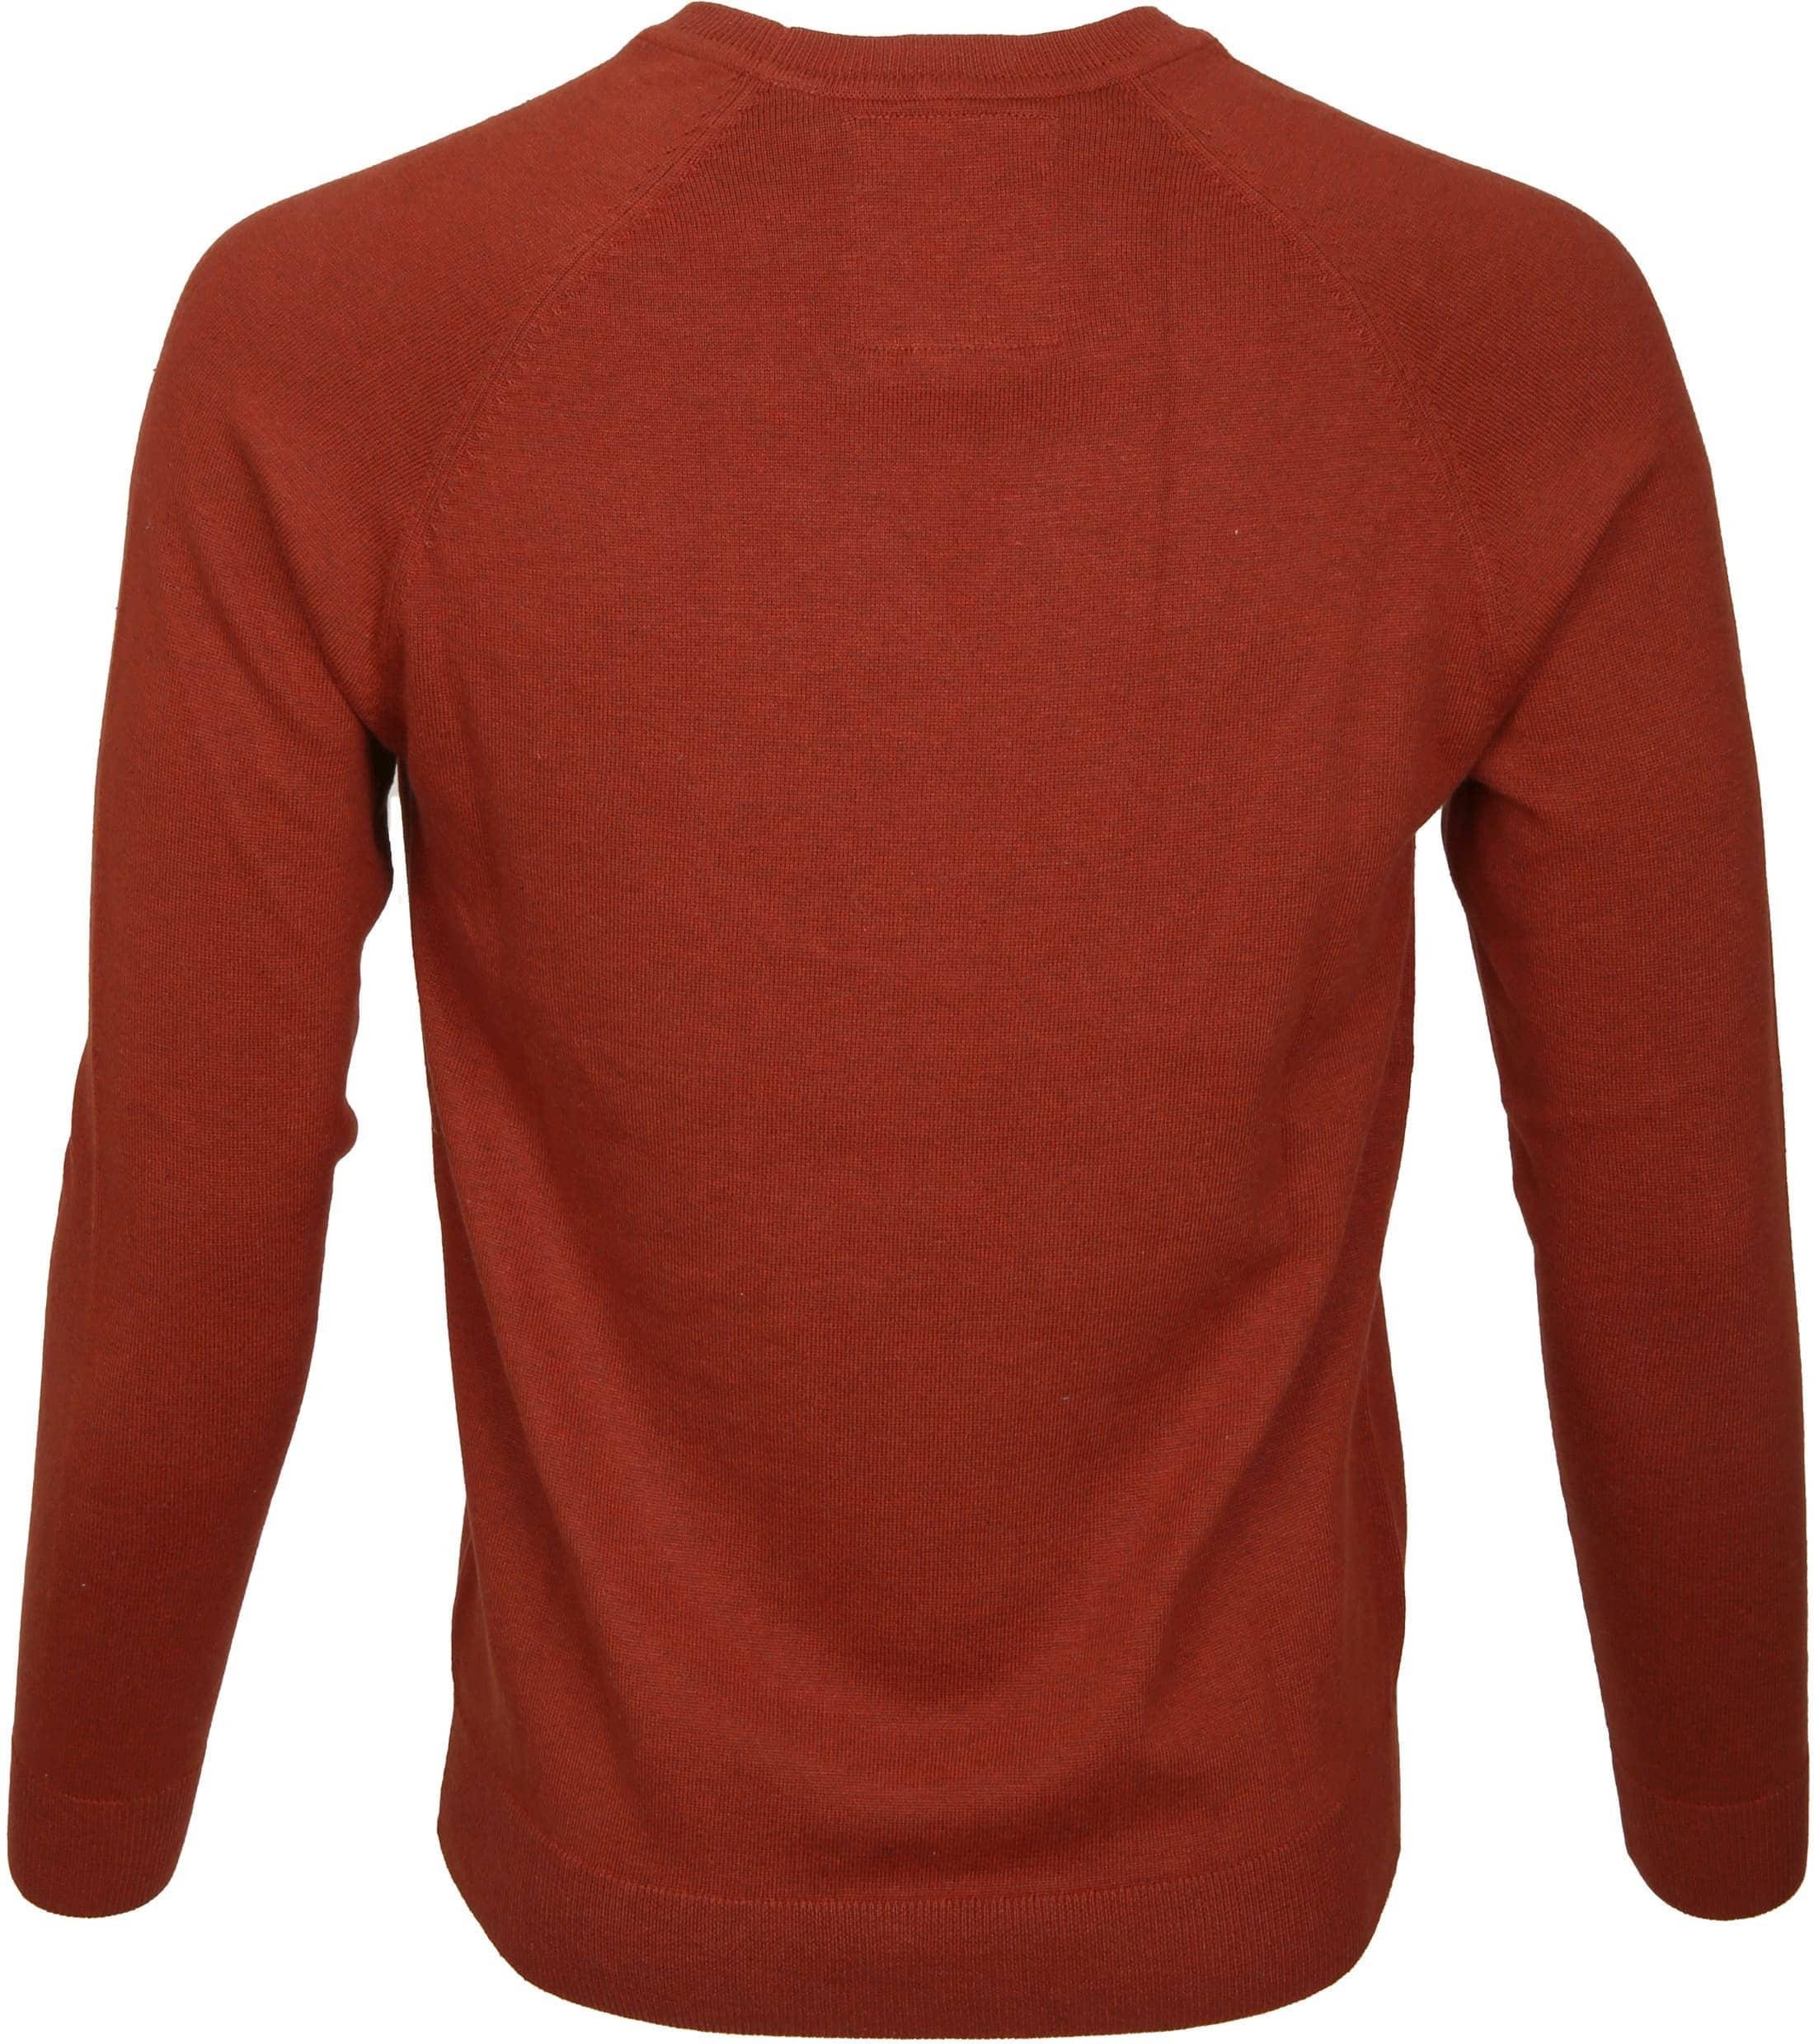 Superdry Sweater Melange Red Orange foto 2